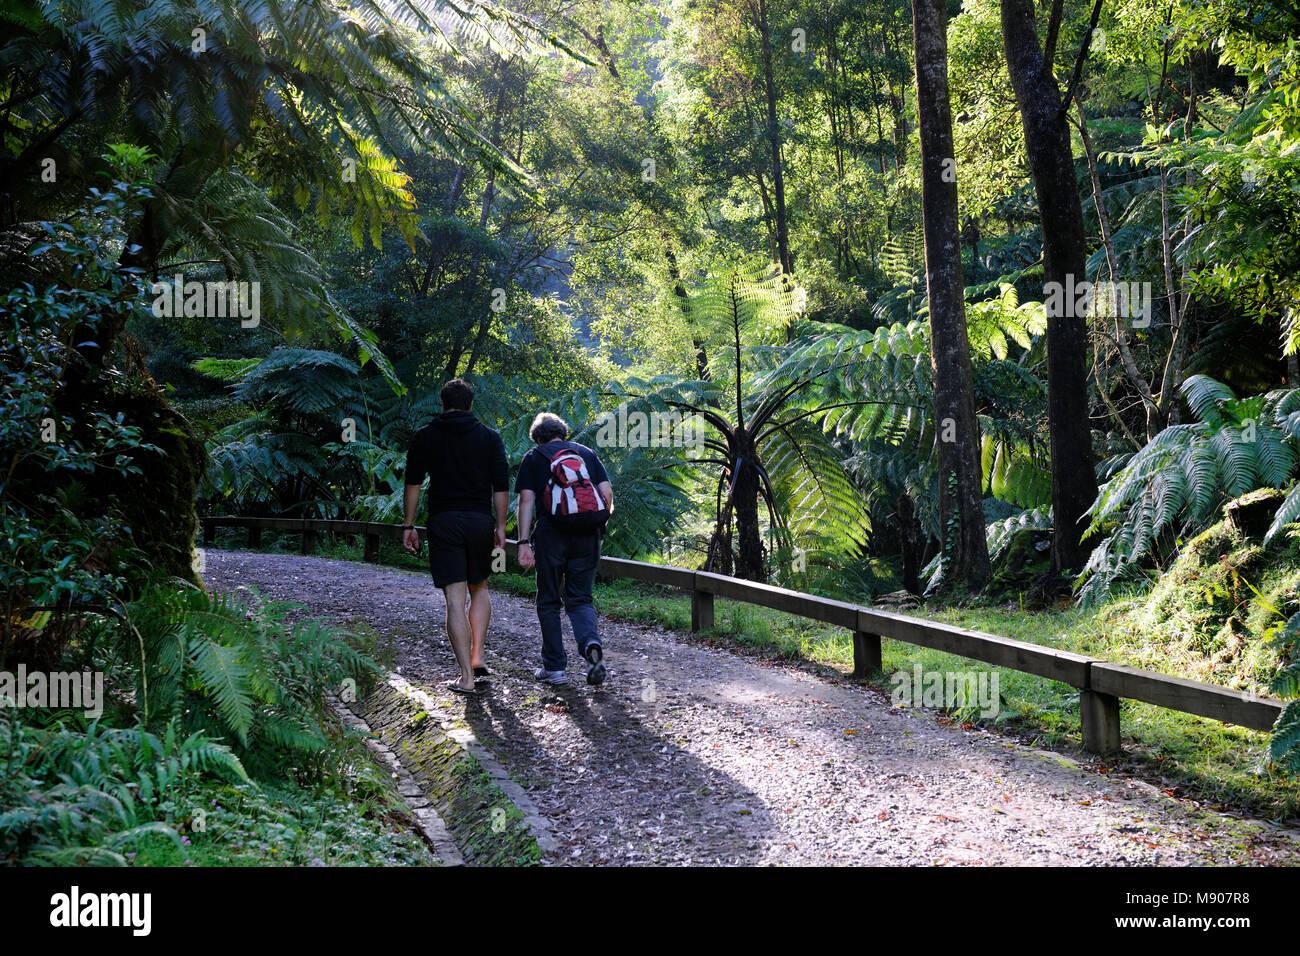 ribeira grande men Two men walking along the forest of caldeira velha,  people enjoy bath in natural thermal pools of caldeira velha near ribeira grande town,.